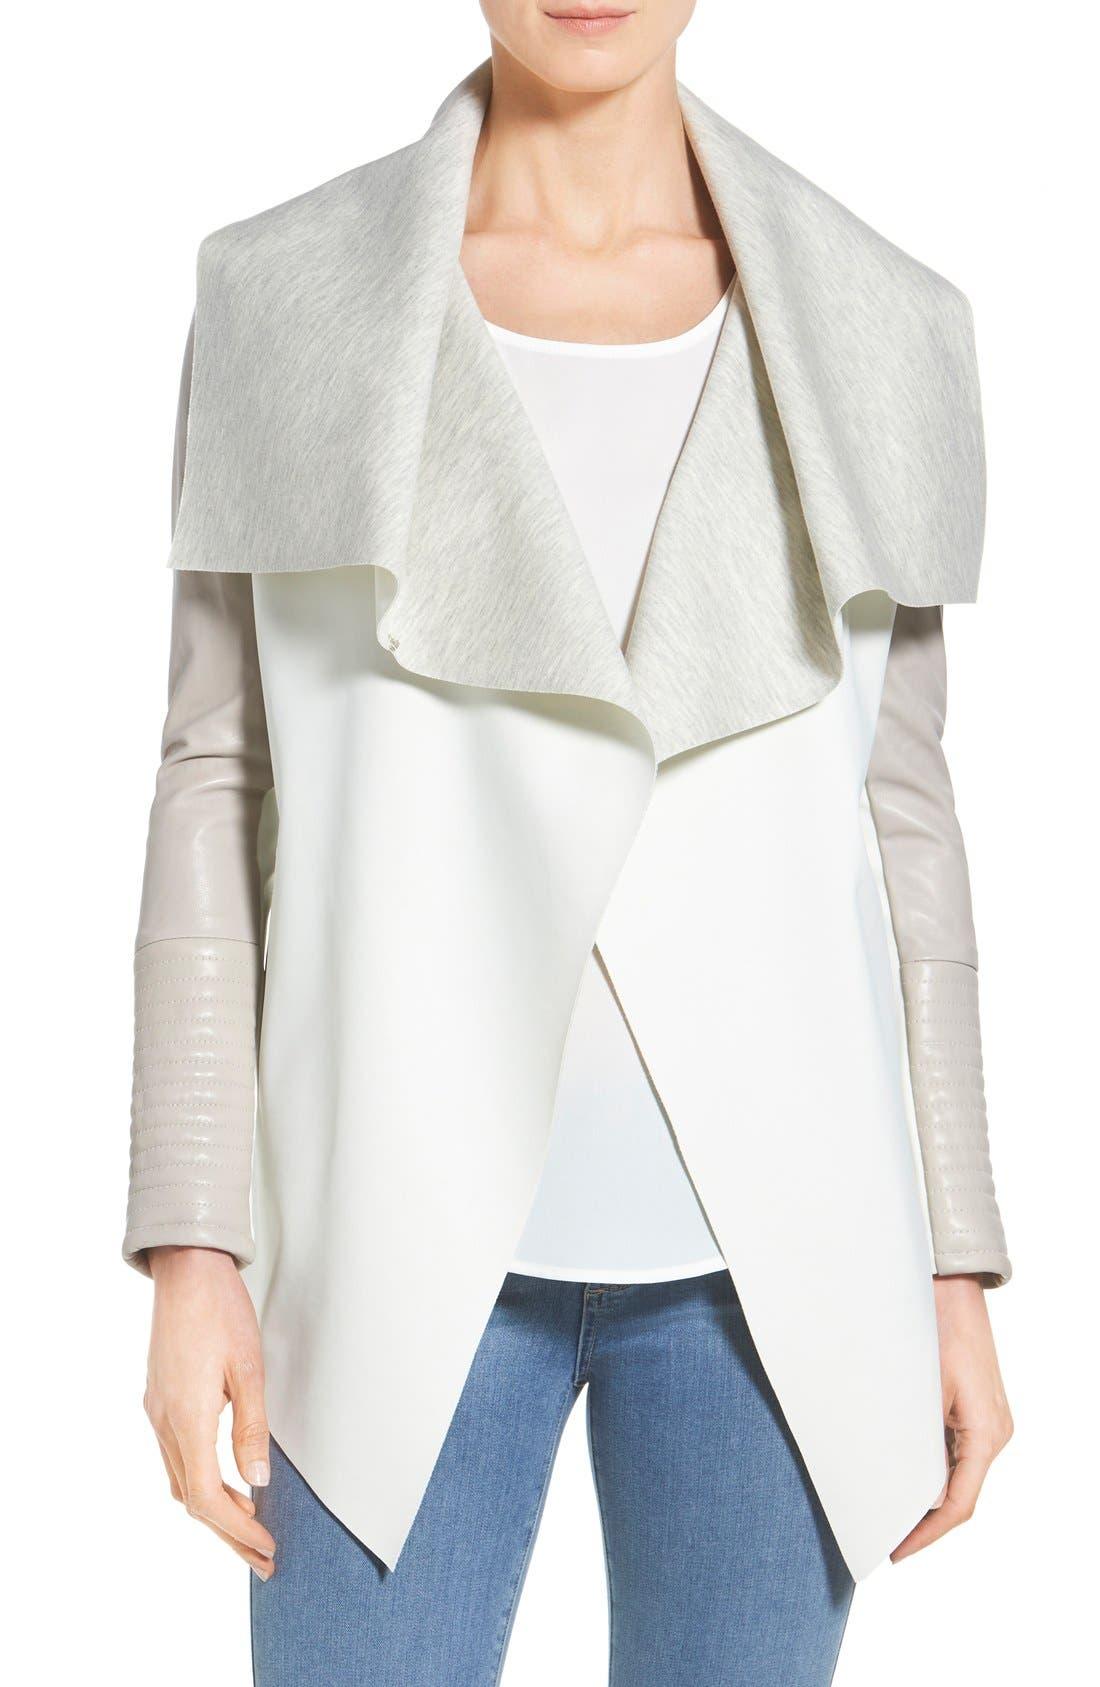 Main Image - Rudsak 'Lamony' Leather Sleeve Neoprene Drape Collar Jacket